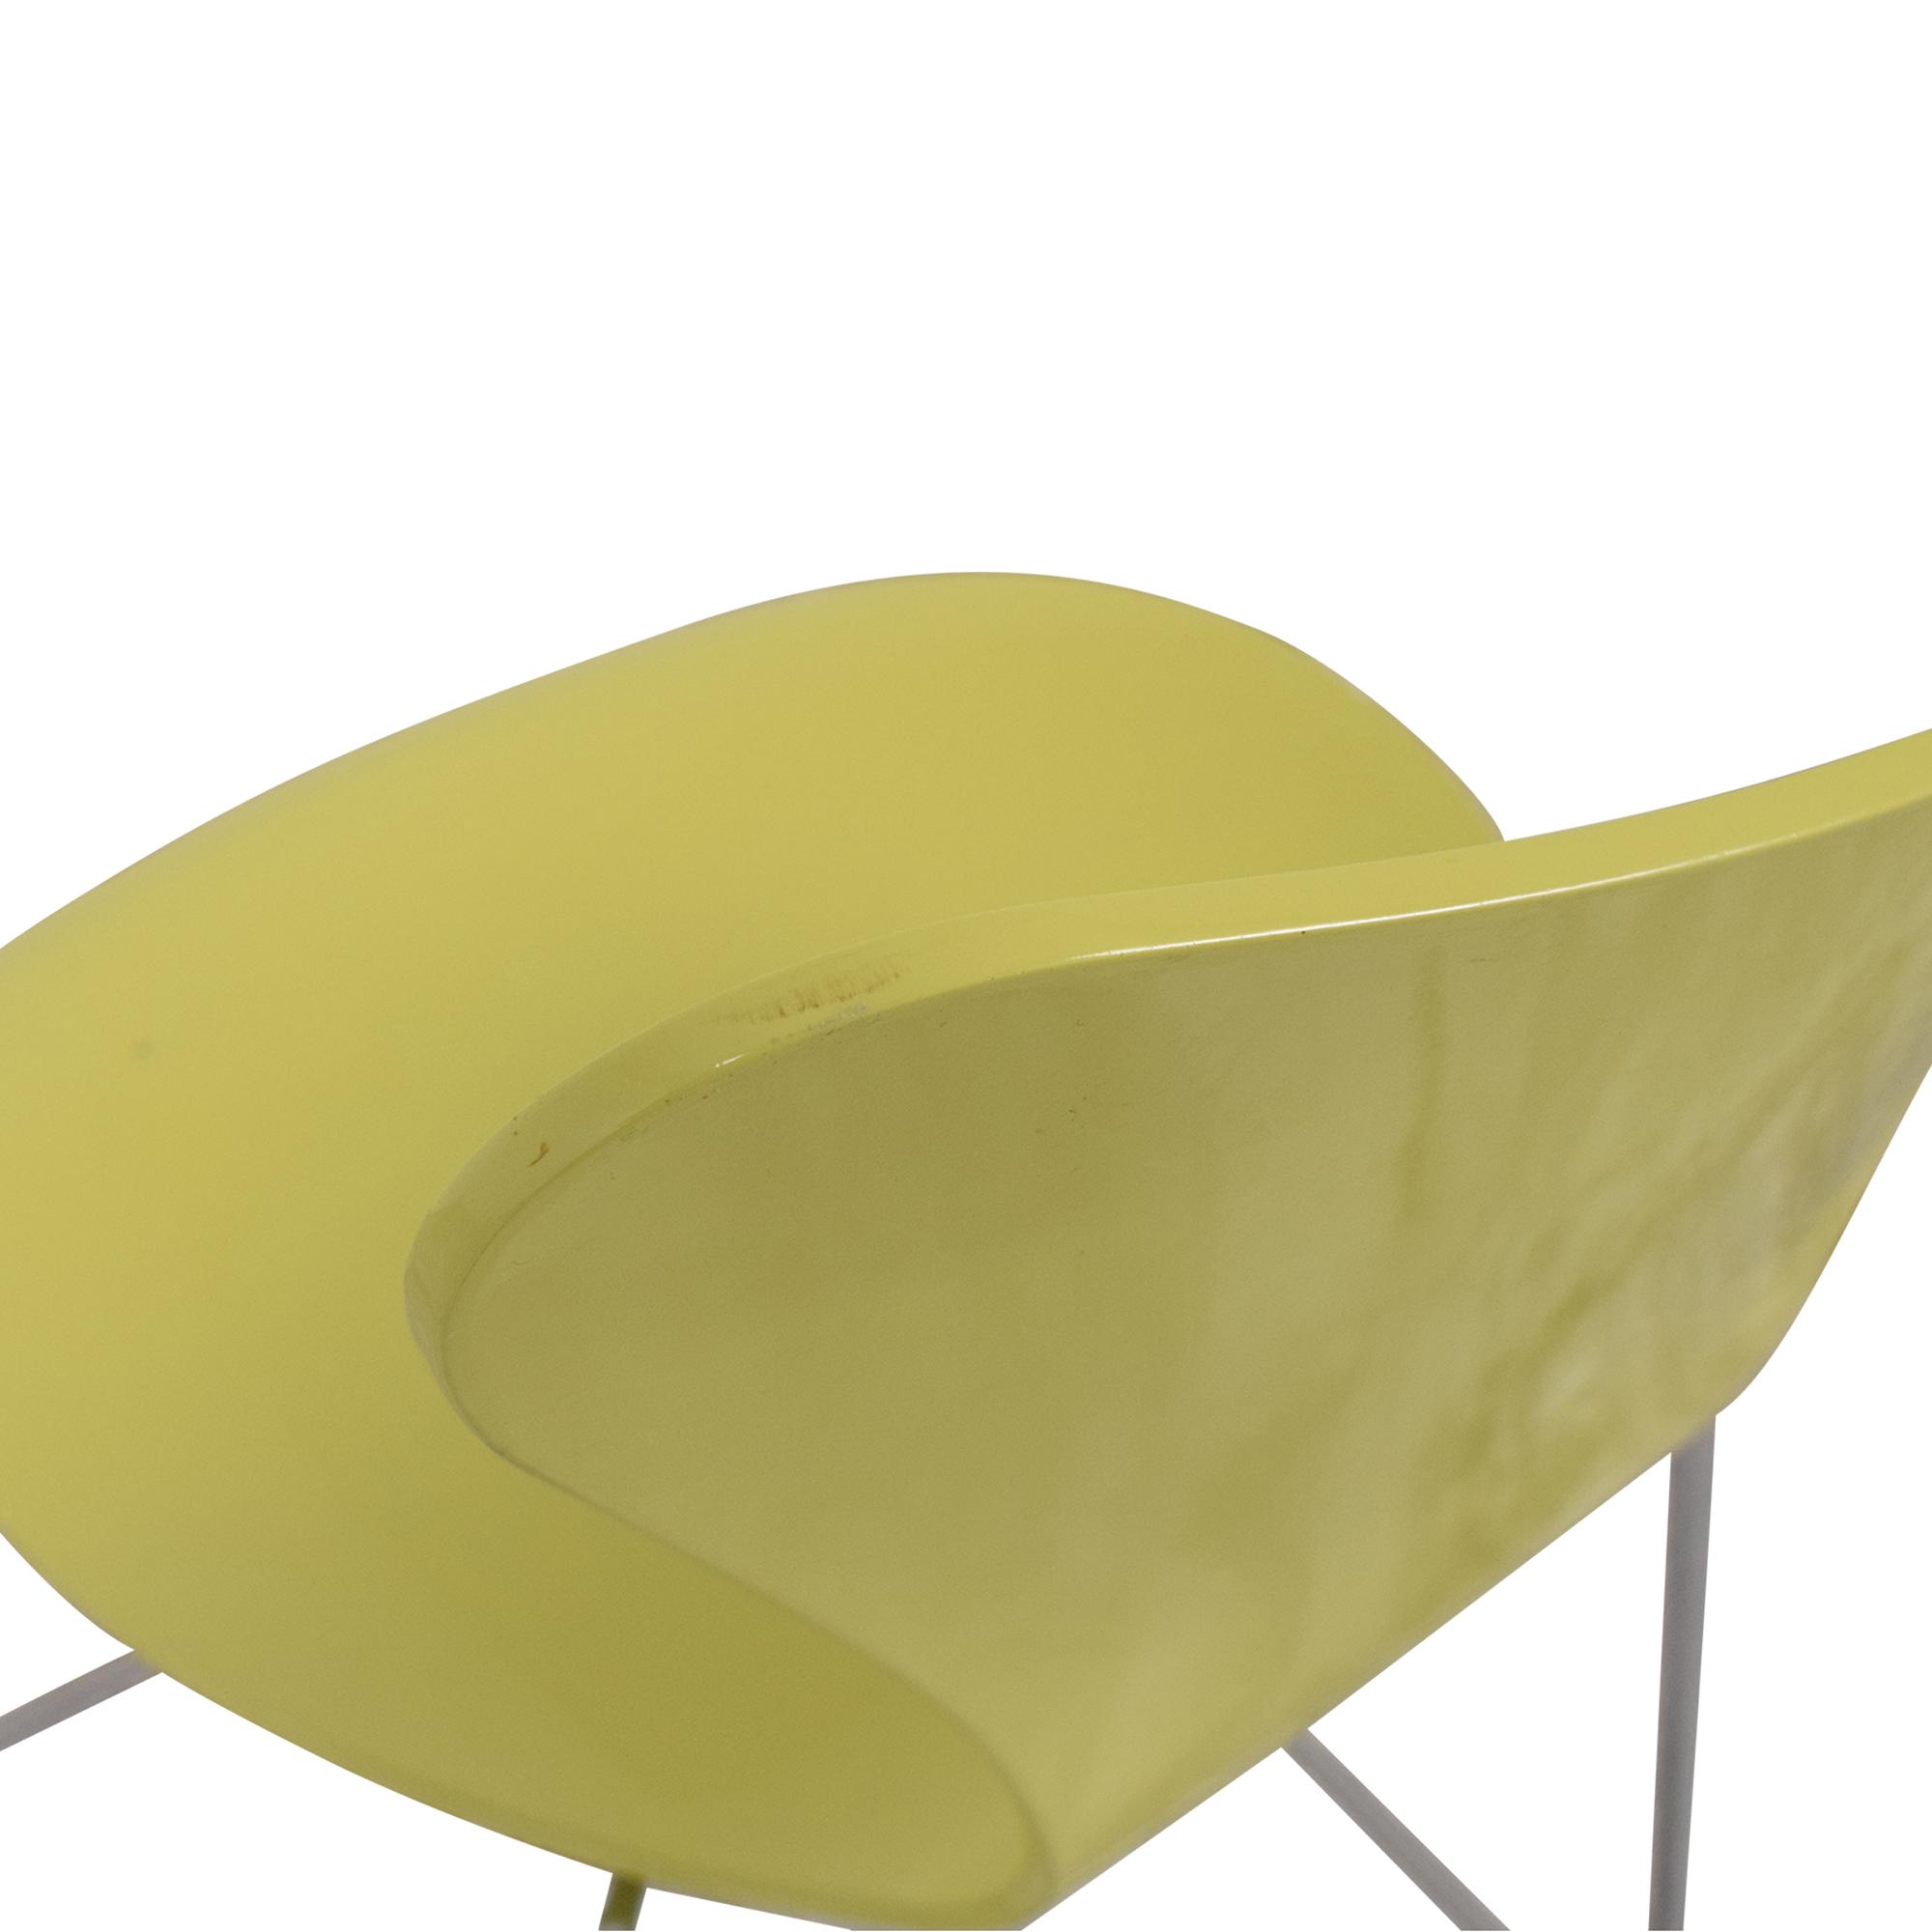 Fritz Hansen Arne Jacobsen for Fritz Hansen Series 7 Stools Dining Chairs